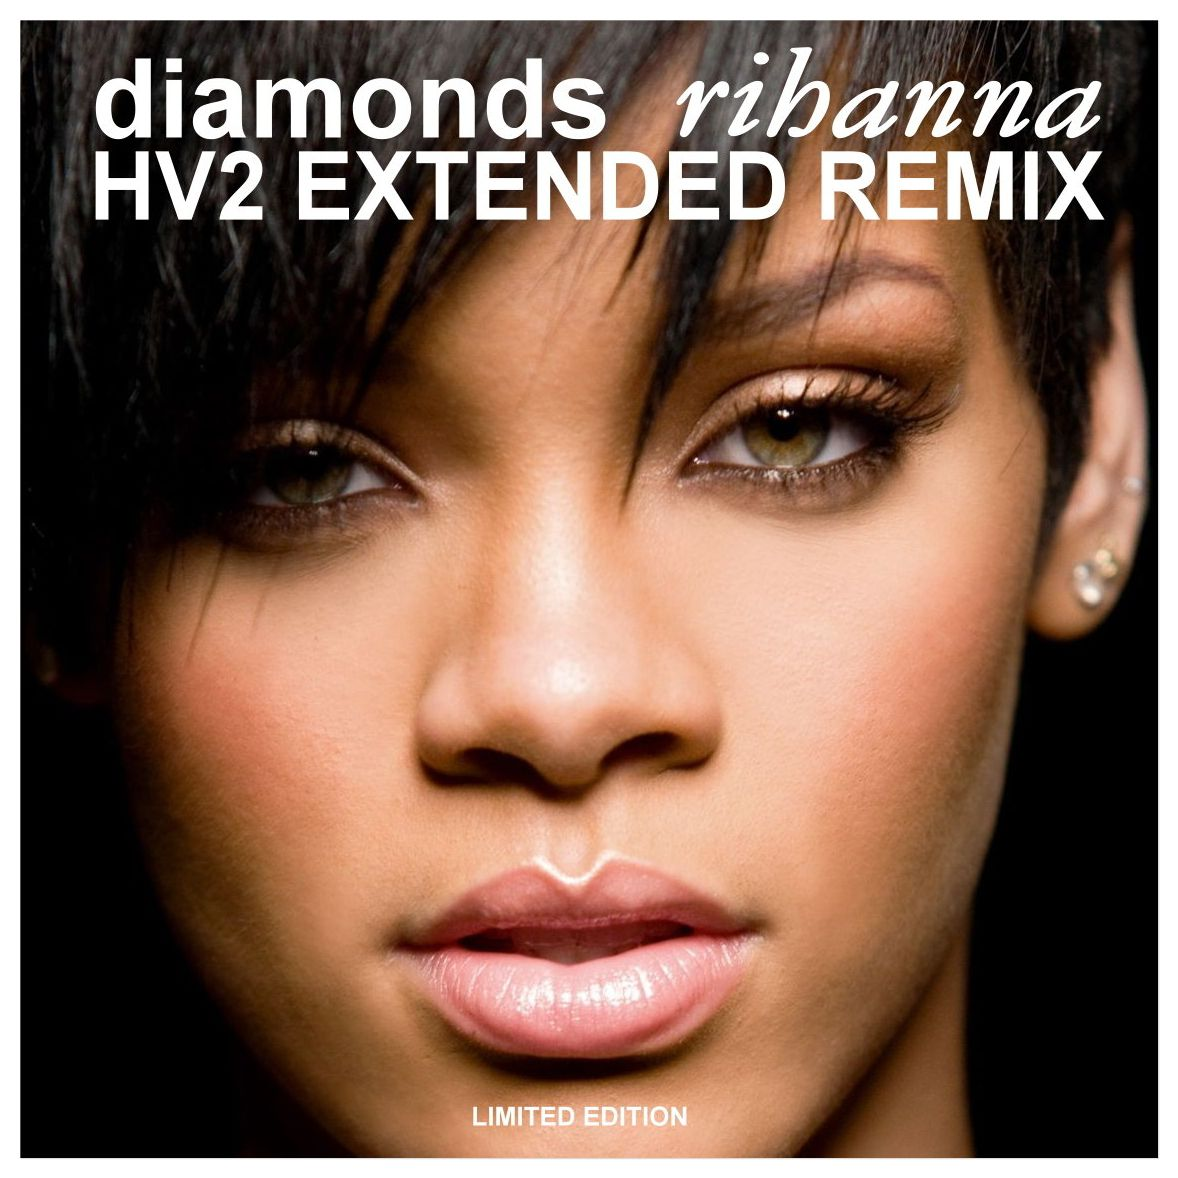 HV2 remixes adamanton madonna rihanna diamonds